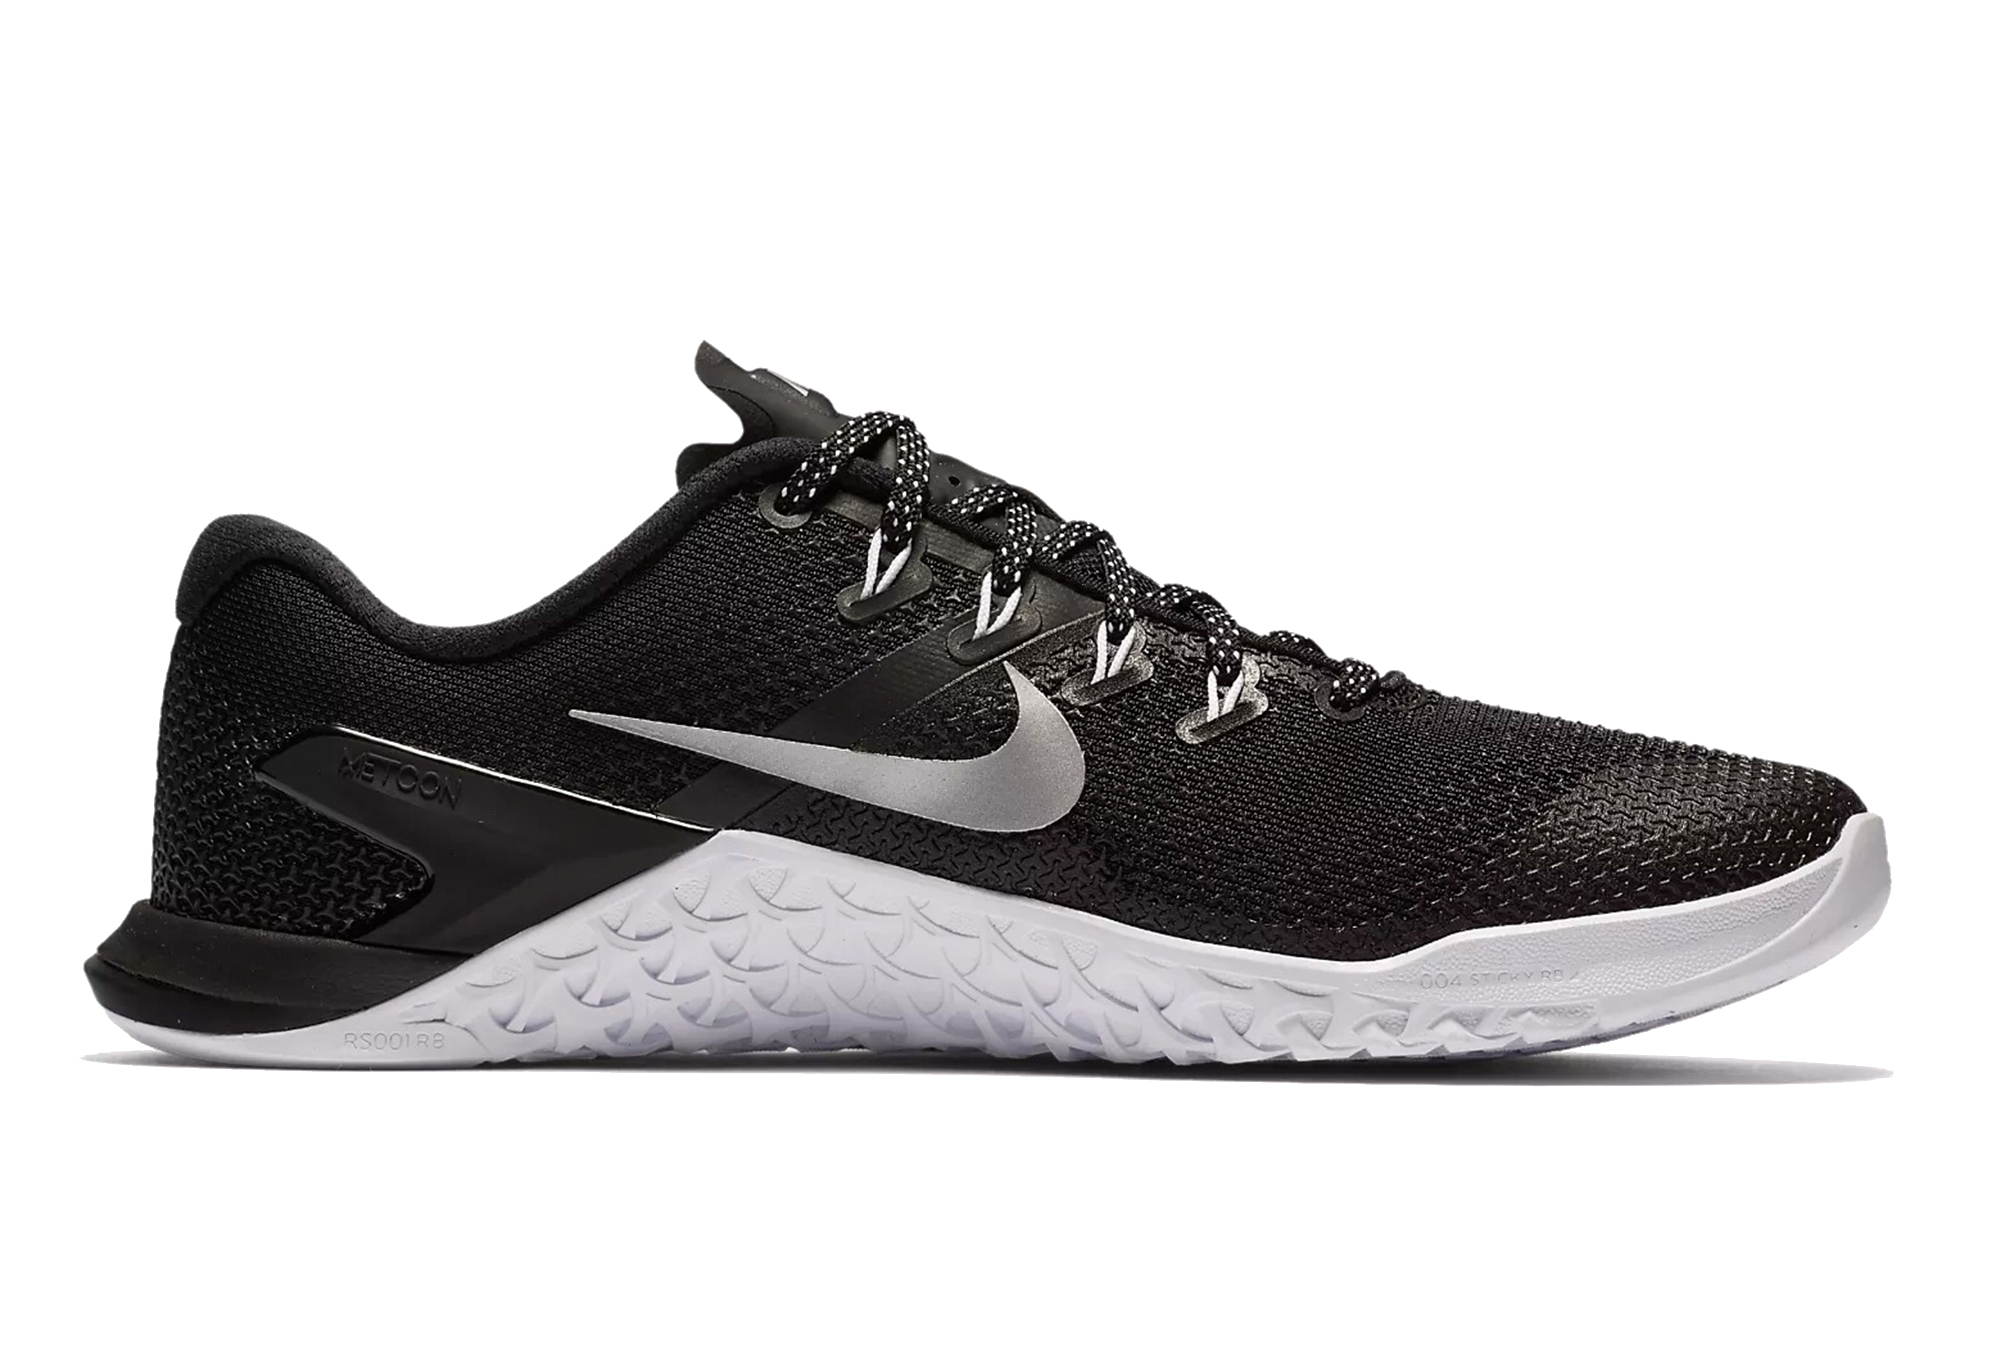 the latest 177ef 669b3 Chaussures de Cross Training Femme Nike Metcon 4 Noir  Blanc